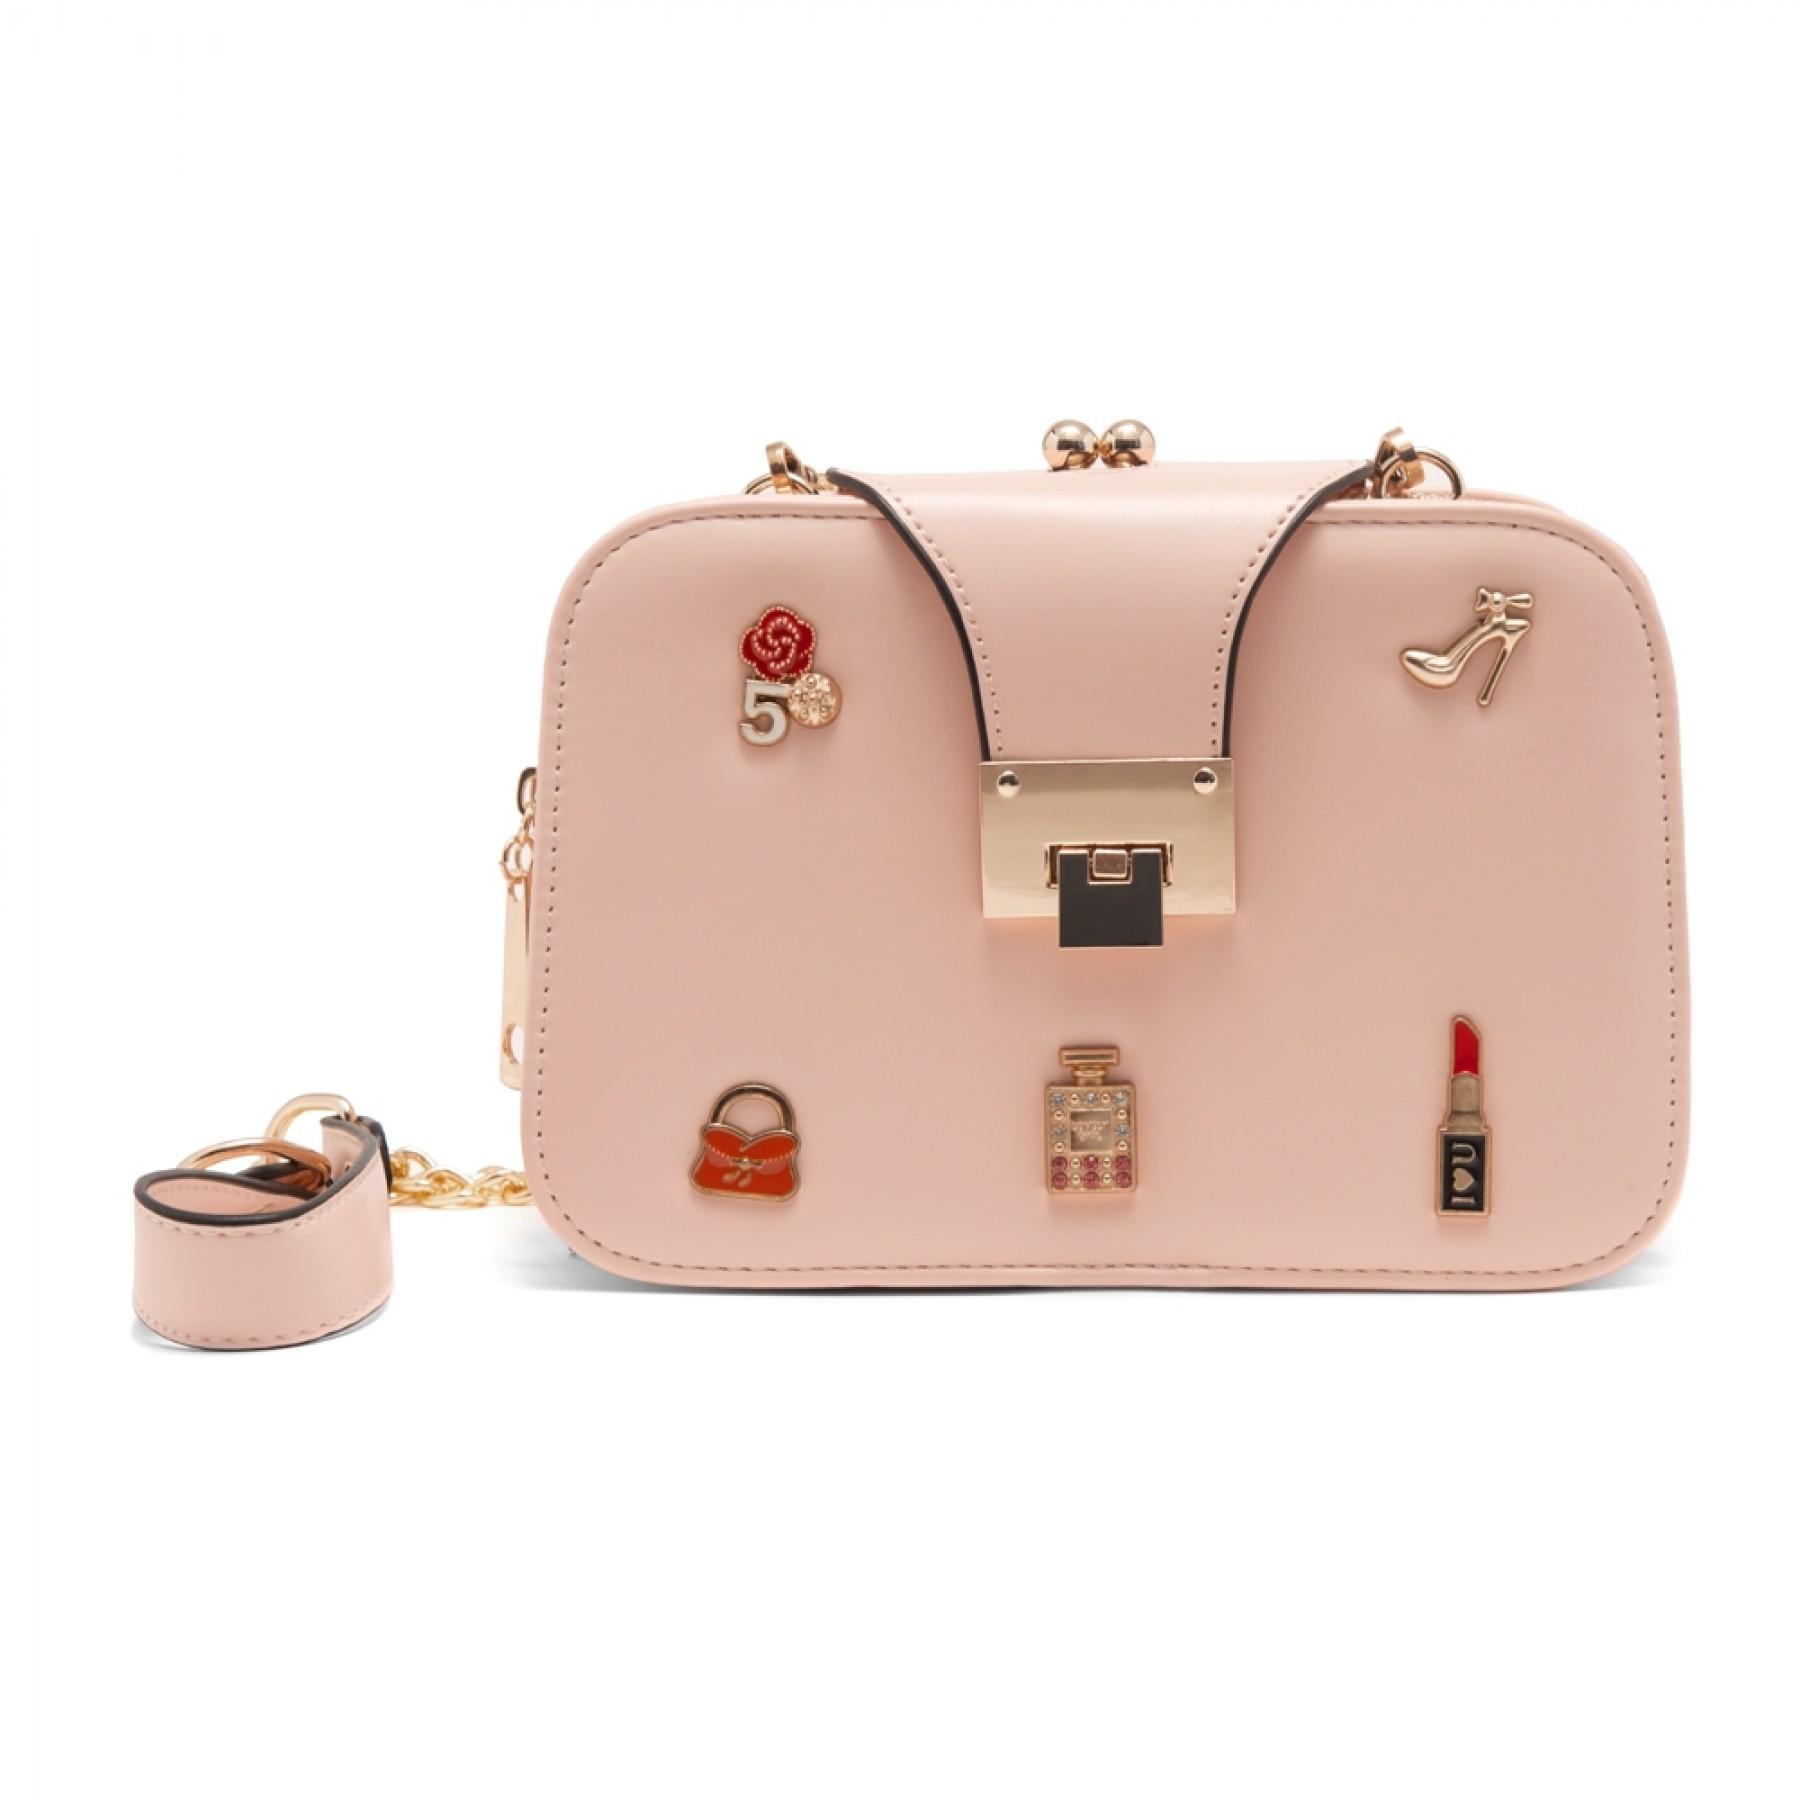 SZ15-LH2-16482 - Women's Trendy Fashion Crossbody Bag (Pink)